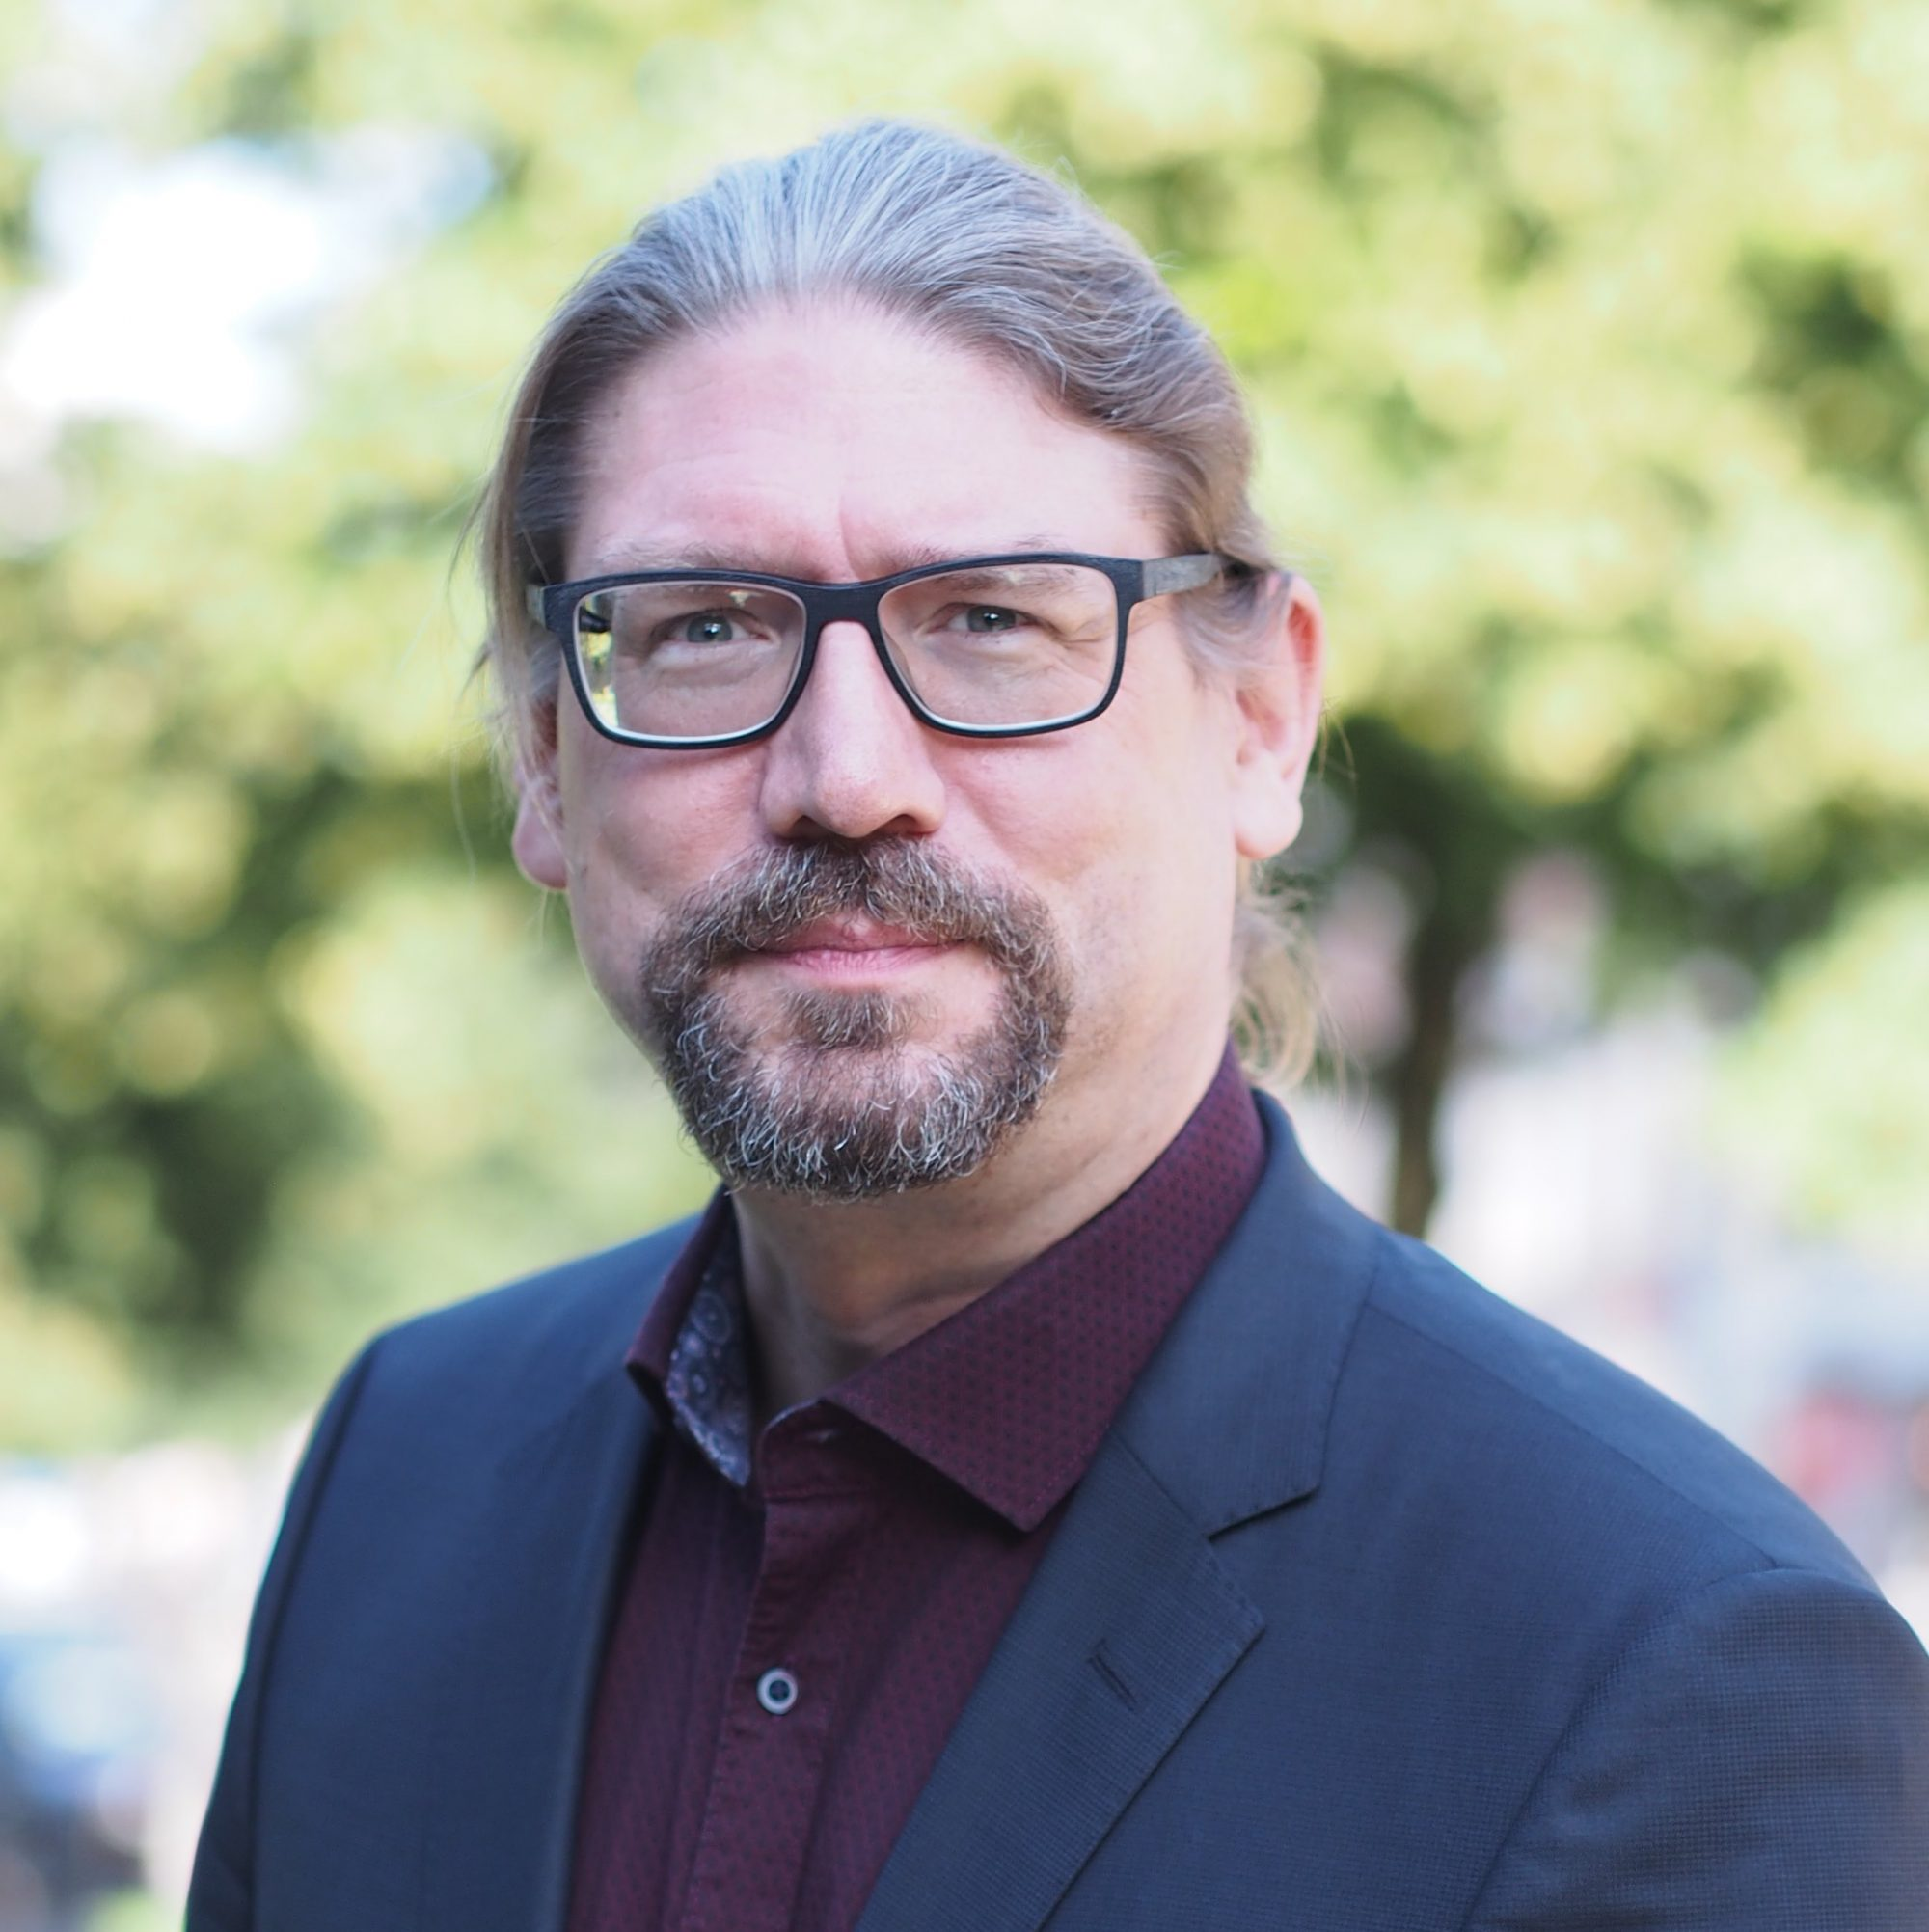 Rechtsanwalt Friedrich Weniger